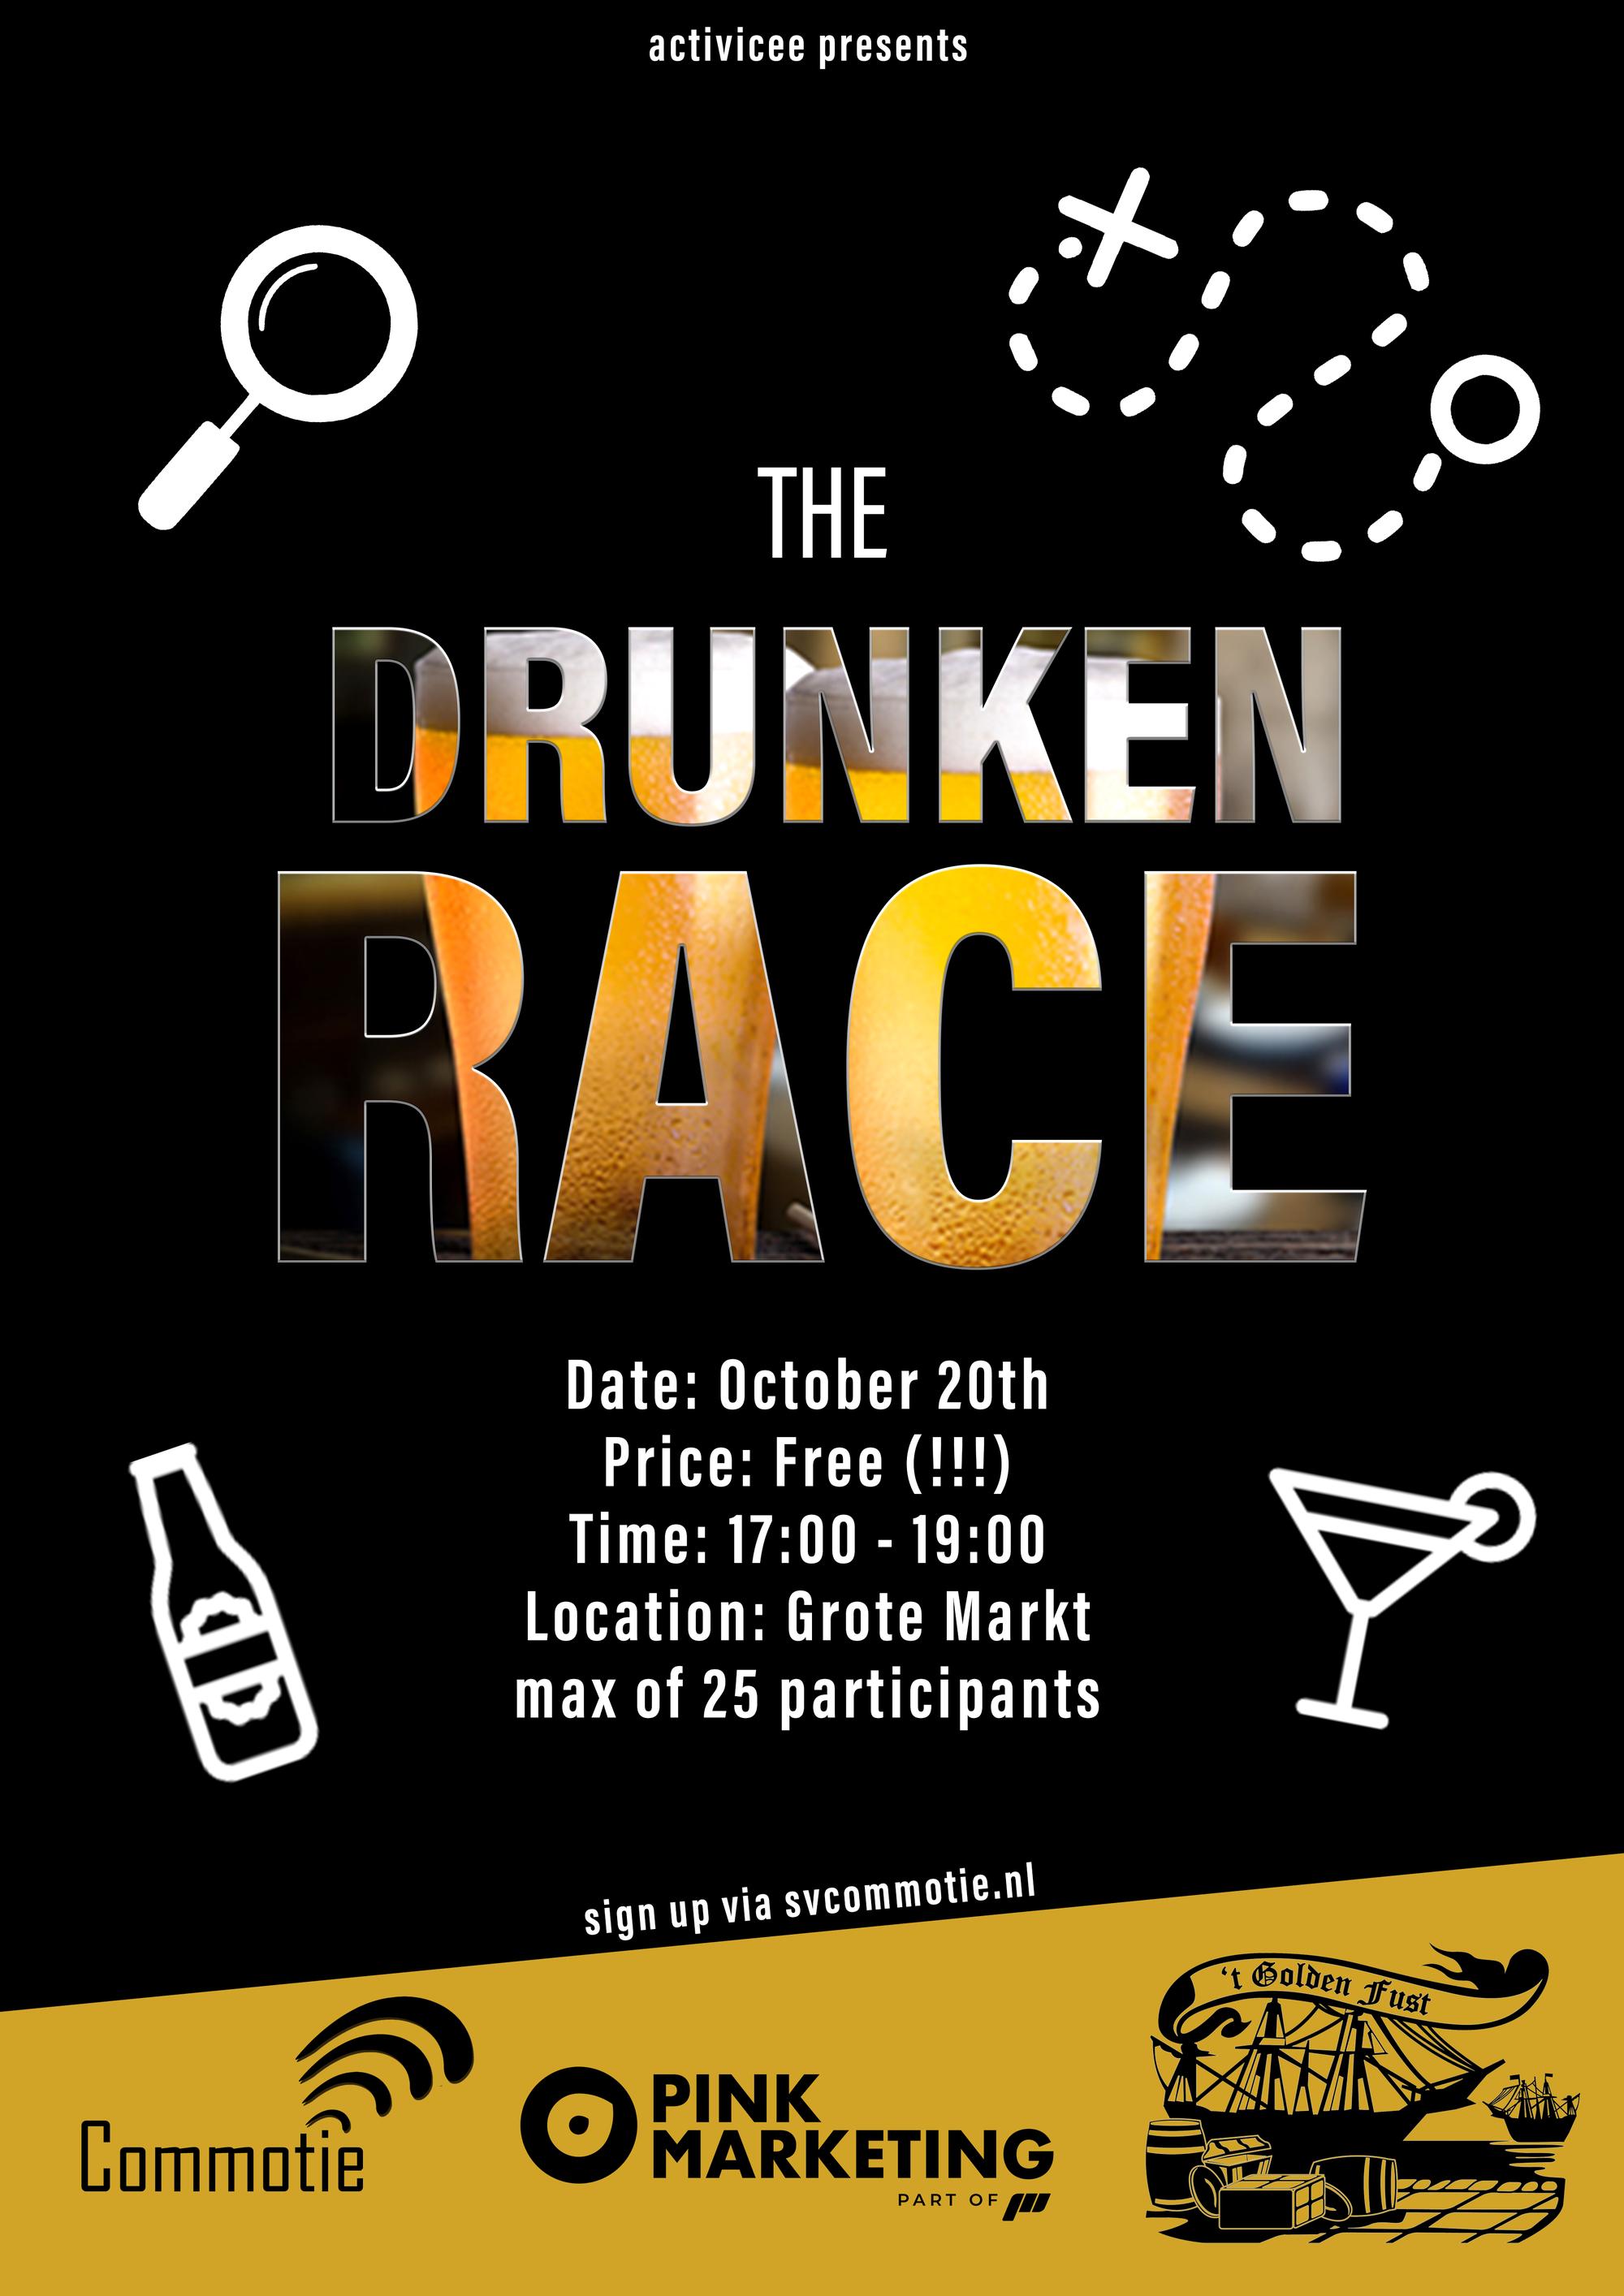 The Drunken Race